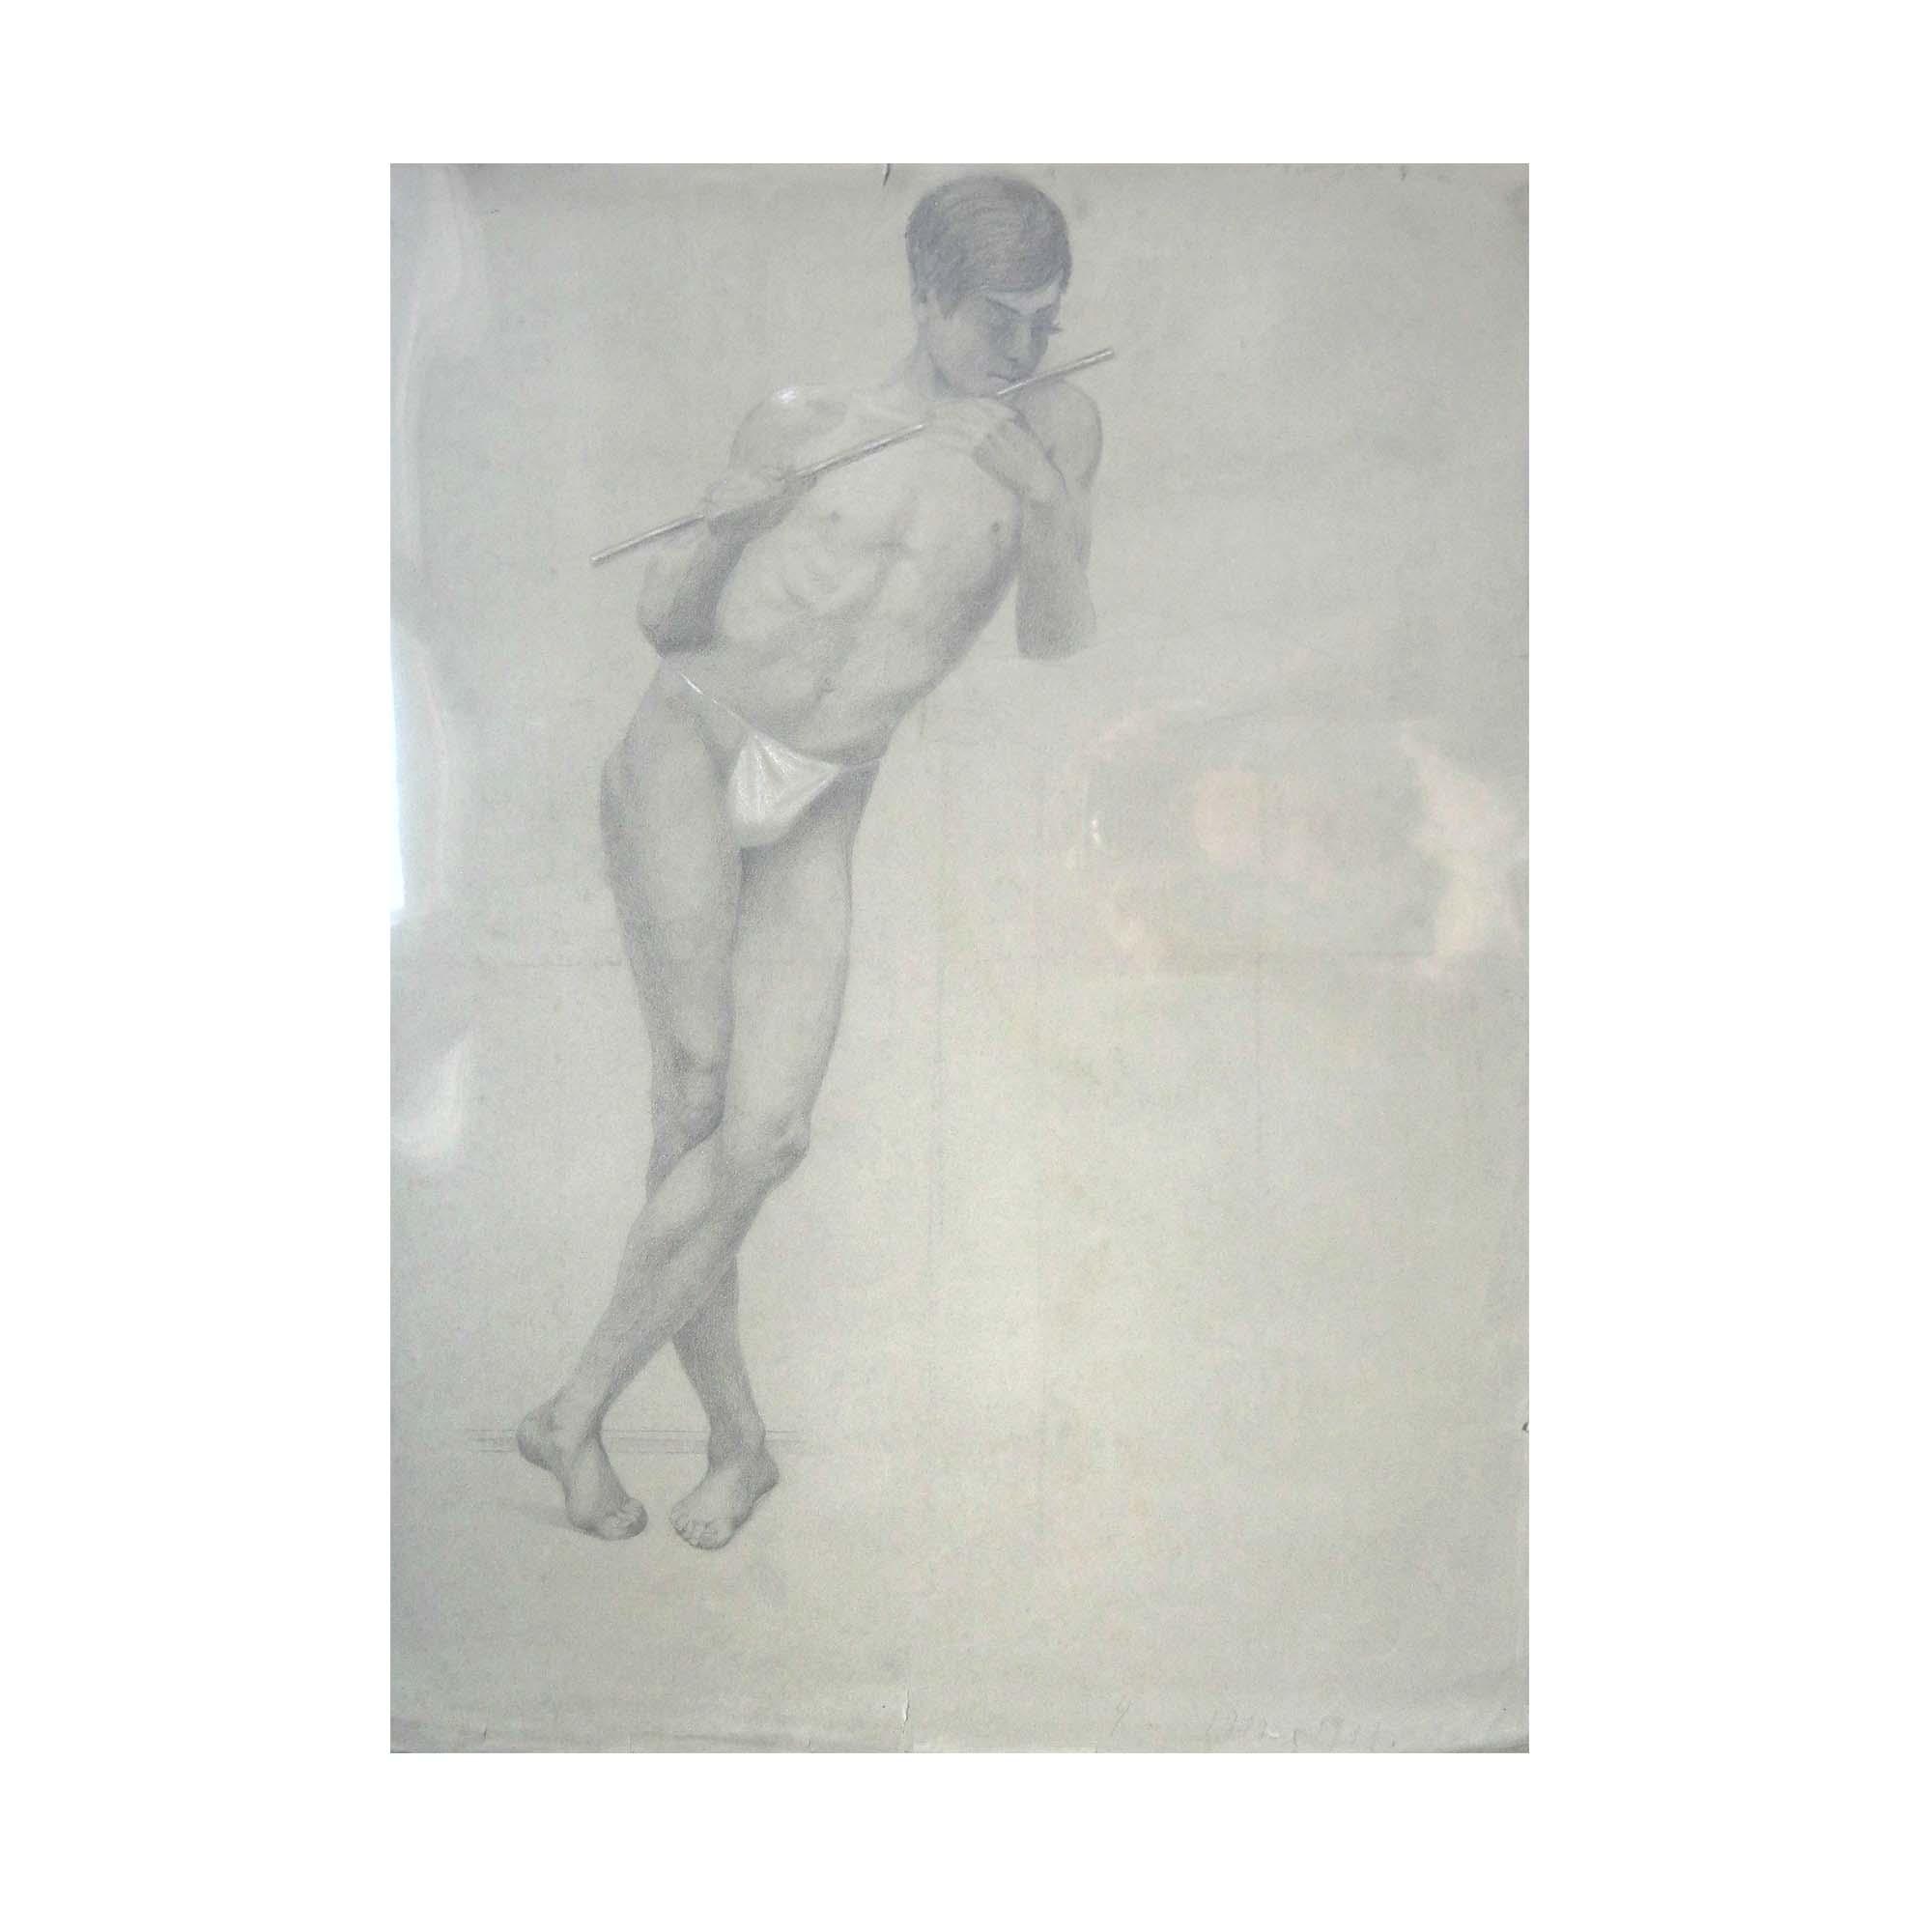 7001-Zeichn.-Knabe-Floete-1910-11-N.jpg